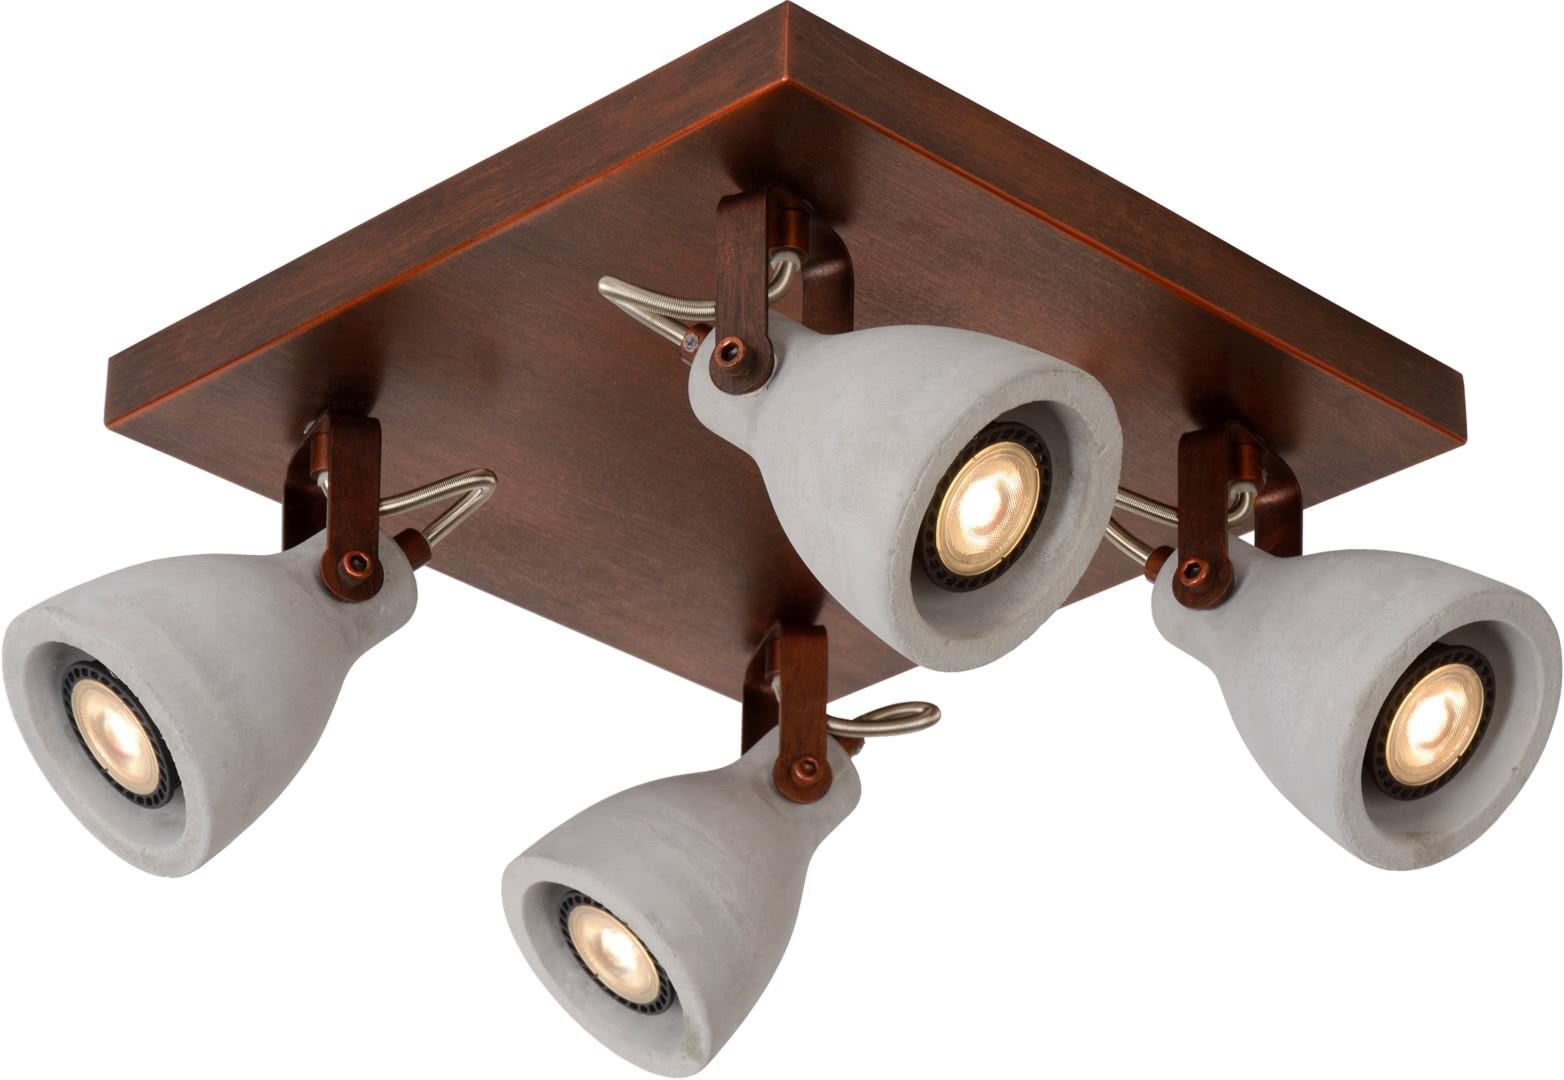 plafonnier industriel carr 4 spots en b ton cuivre kyrios. Black Bedroom Furniture Sets. Home Design Ideas